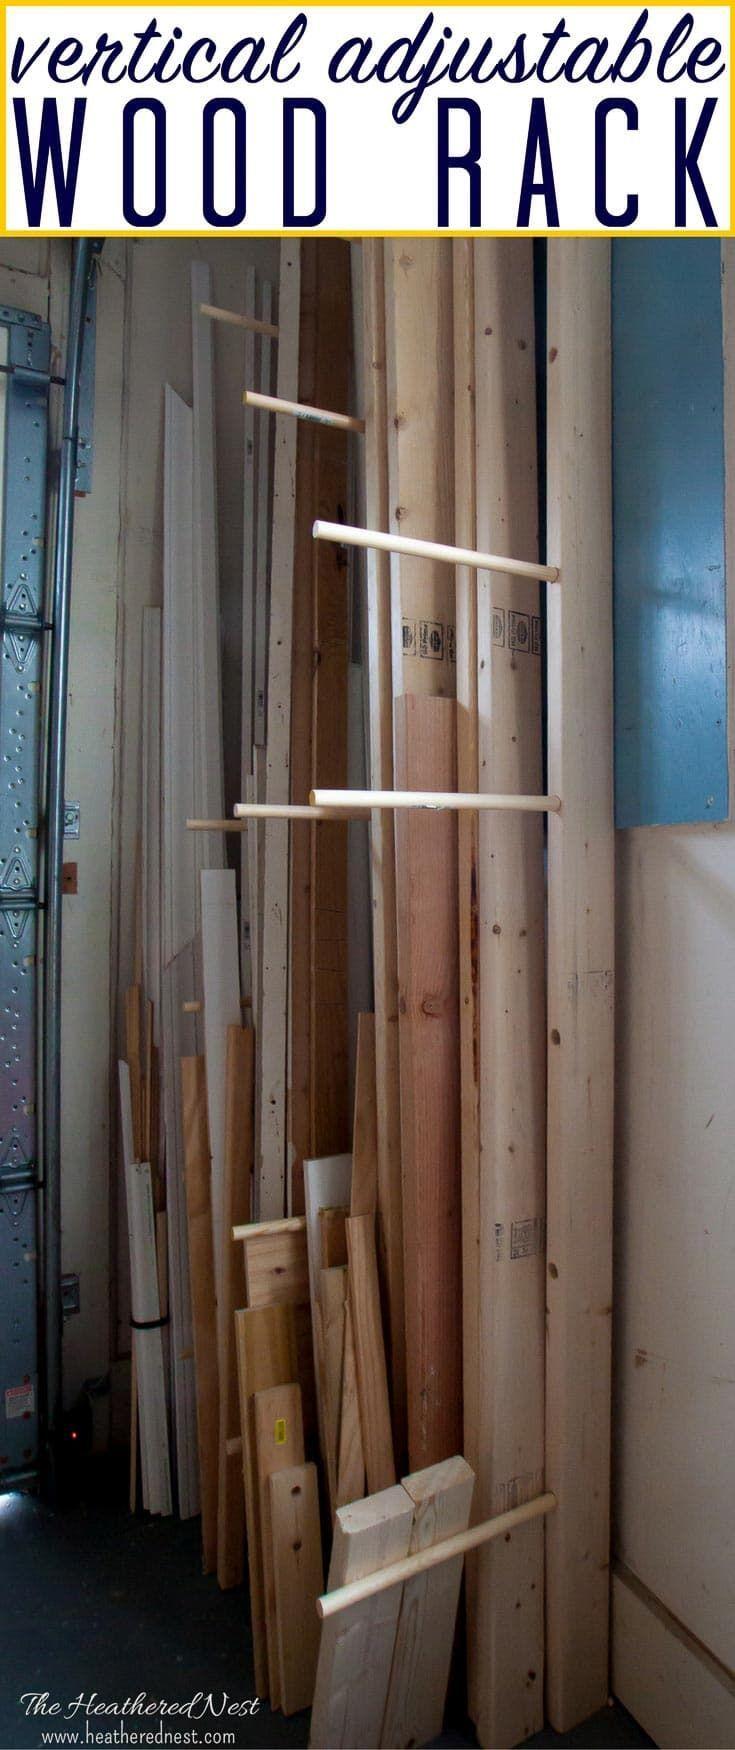 DIY Woodworking Ideas A simple, adjustable, DIY vertical wood rack to store lumber. Love how this easi...